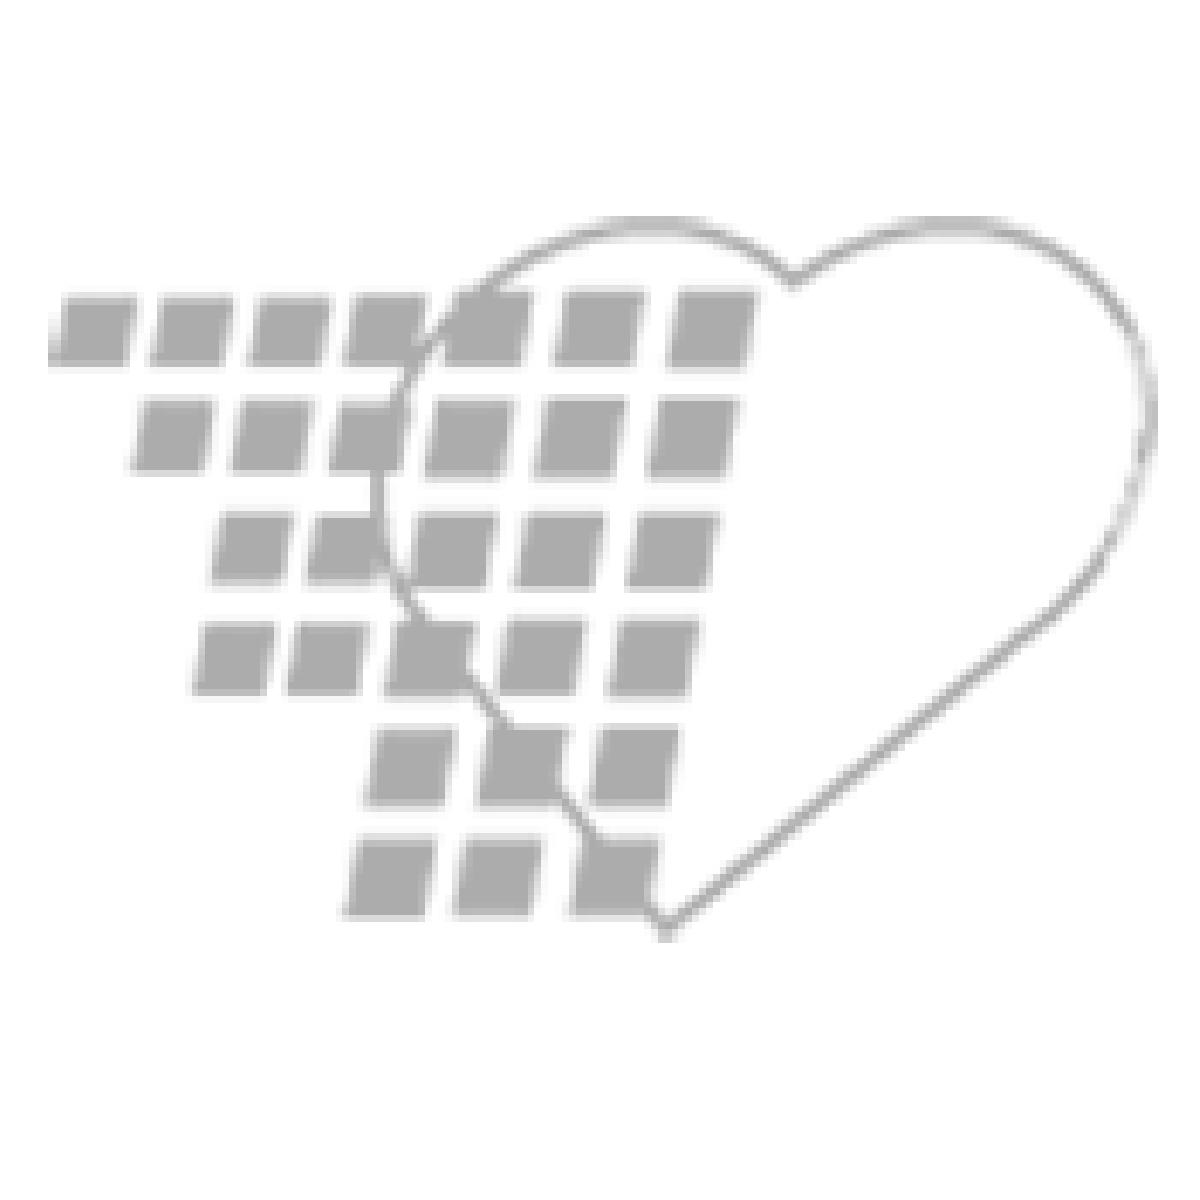 05-46-7751 Kangaroo™ Epump ENPlus Spike with Flush Bag Anti-free Flo - 1000 mL